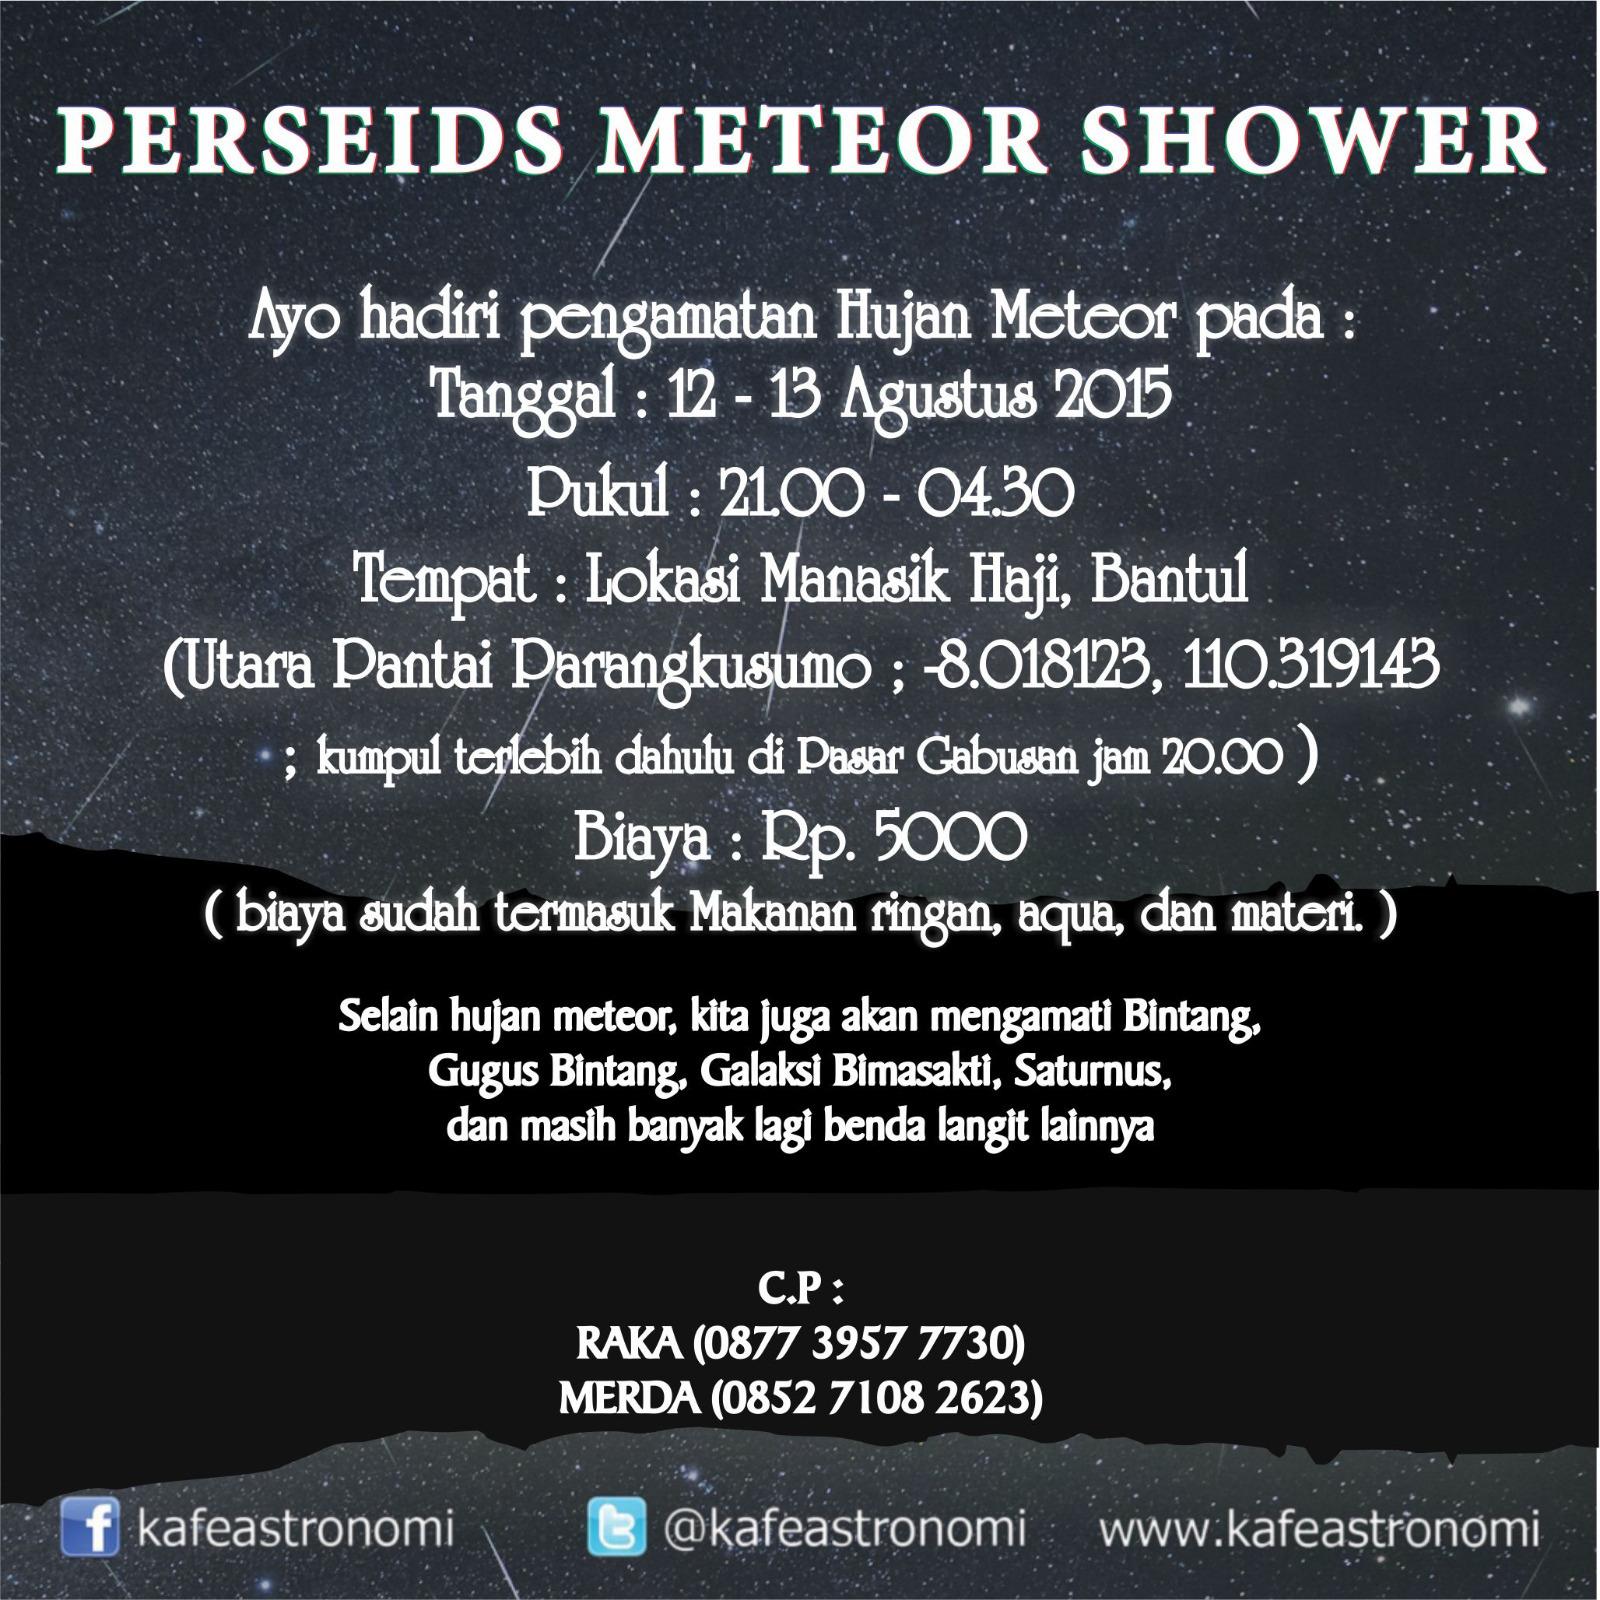 Info Hujan Meteor